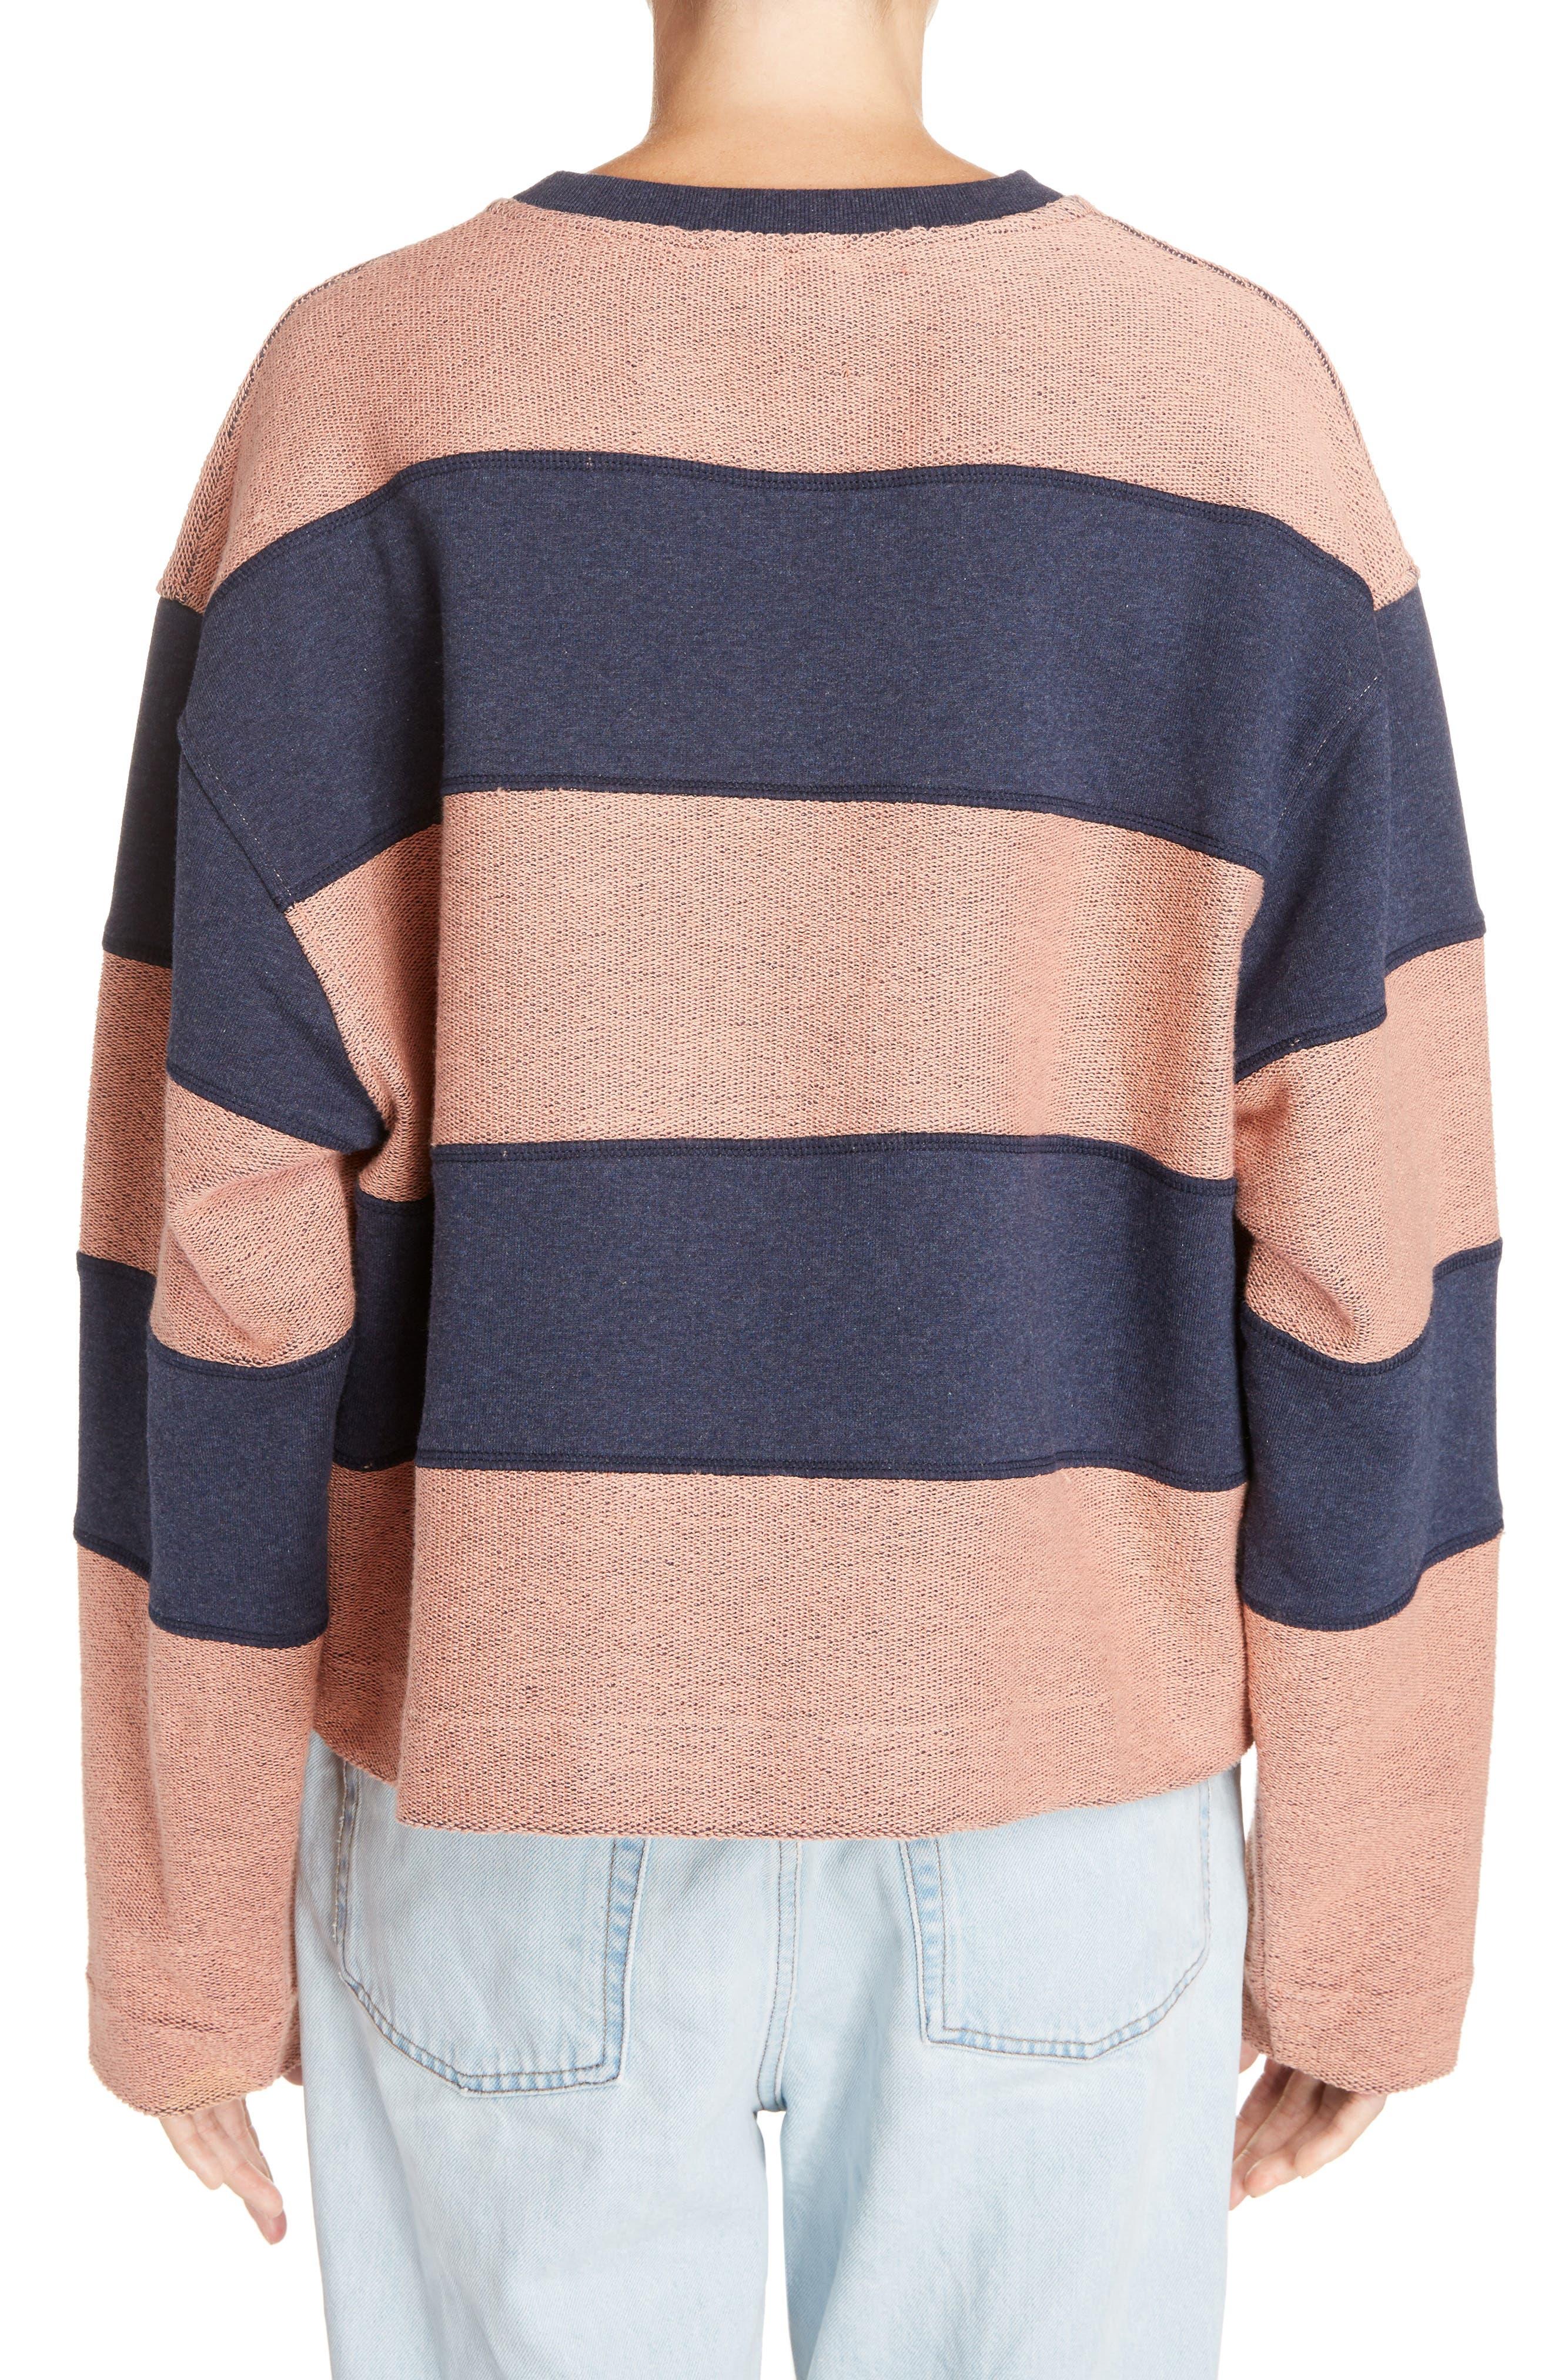 Diana Stripe Sweatshirt,                             Alternate thumbnail 2, color,                             Navy Melange/ Pink